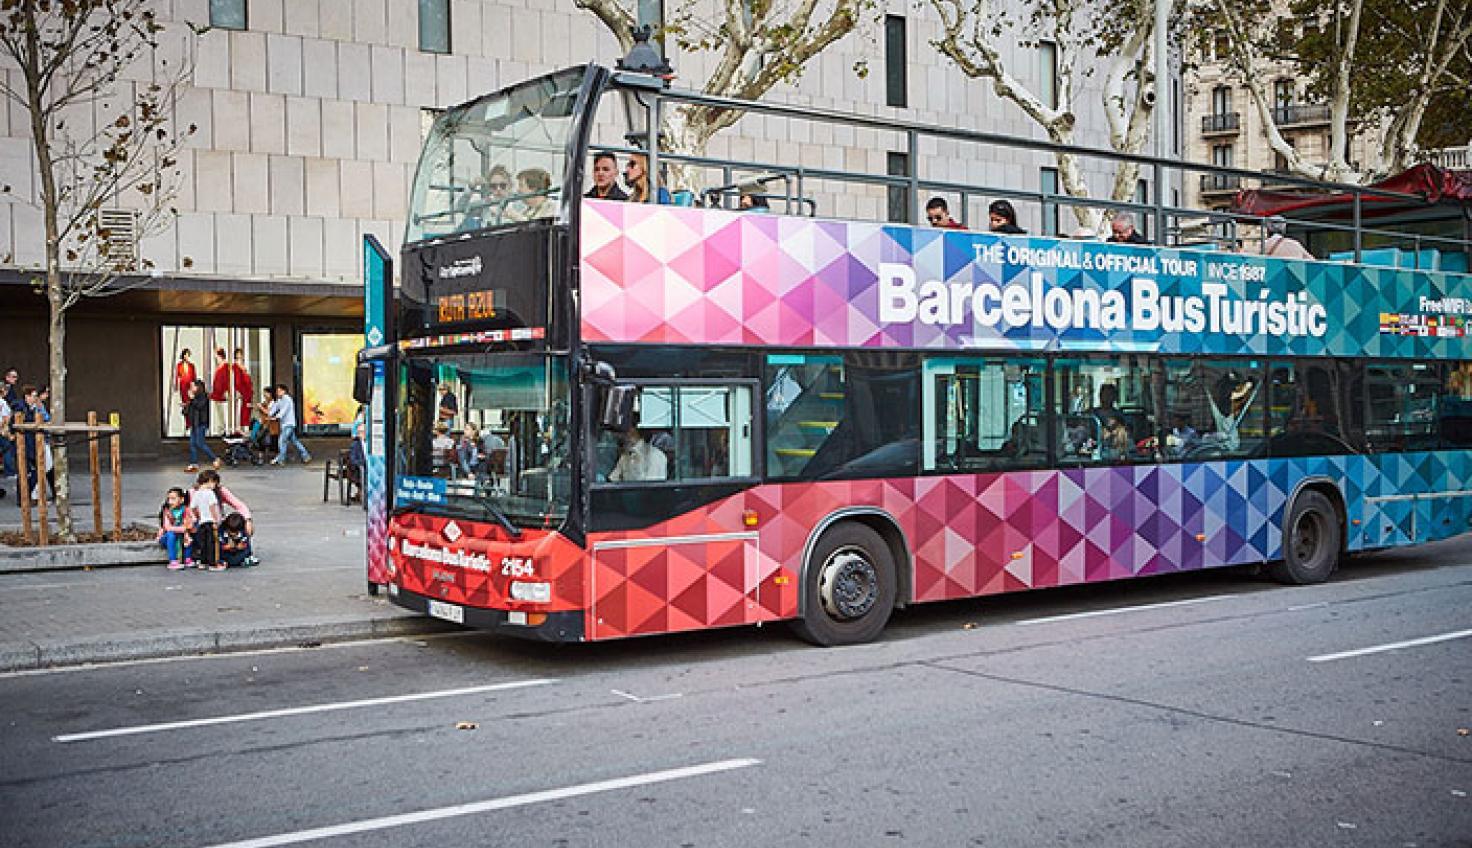 Plaça de Catalunya stop